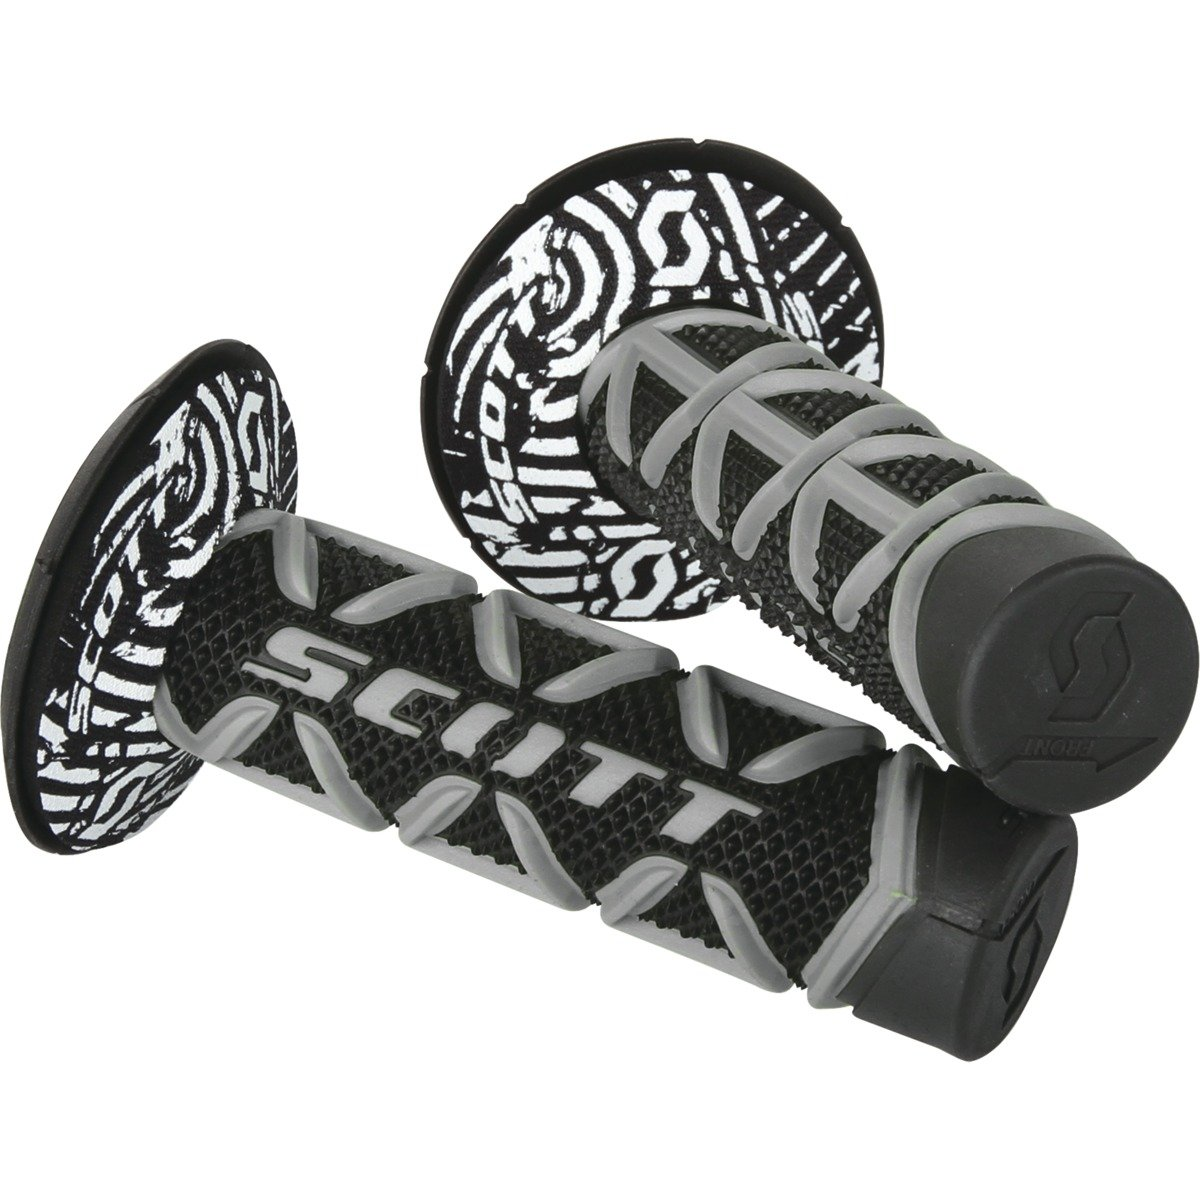 Donut schwarz//weiss Scott Diamond MX Motorrad Griffe inkl